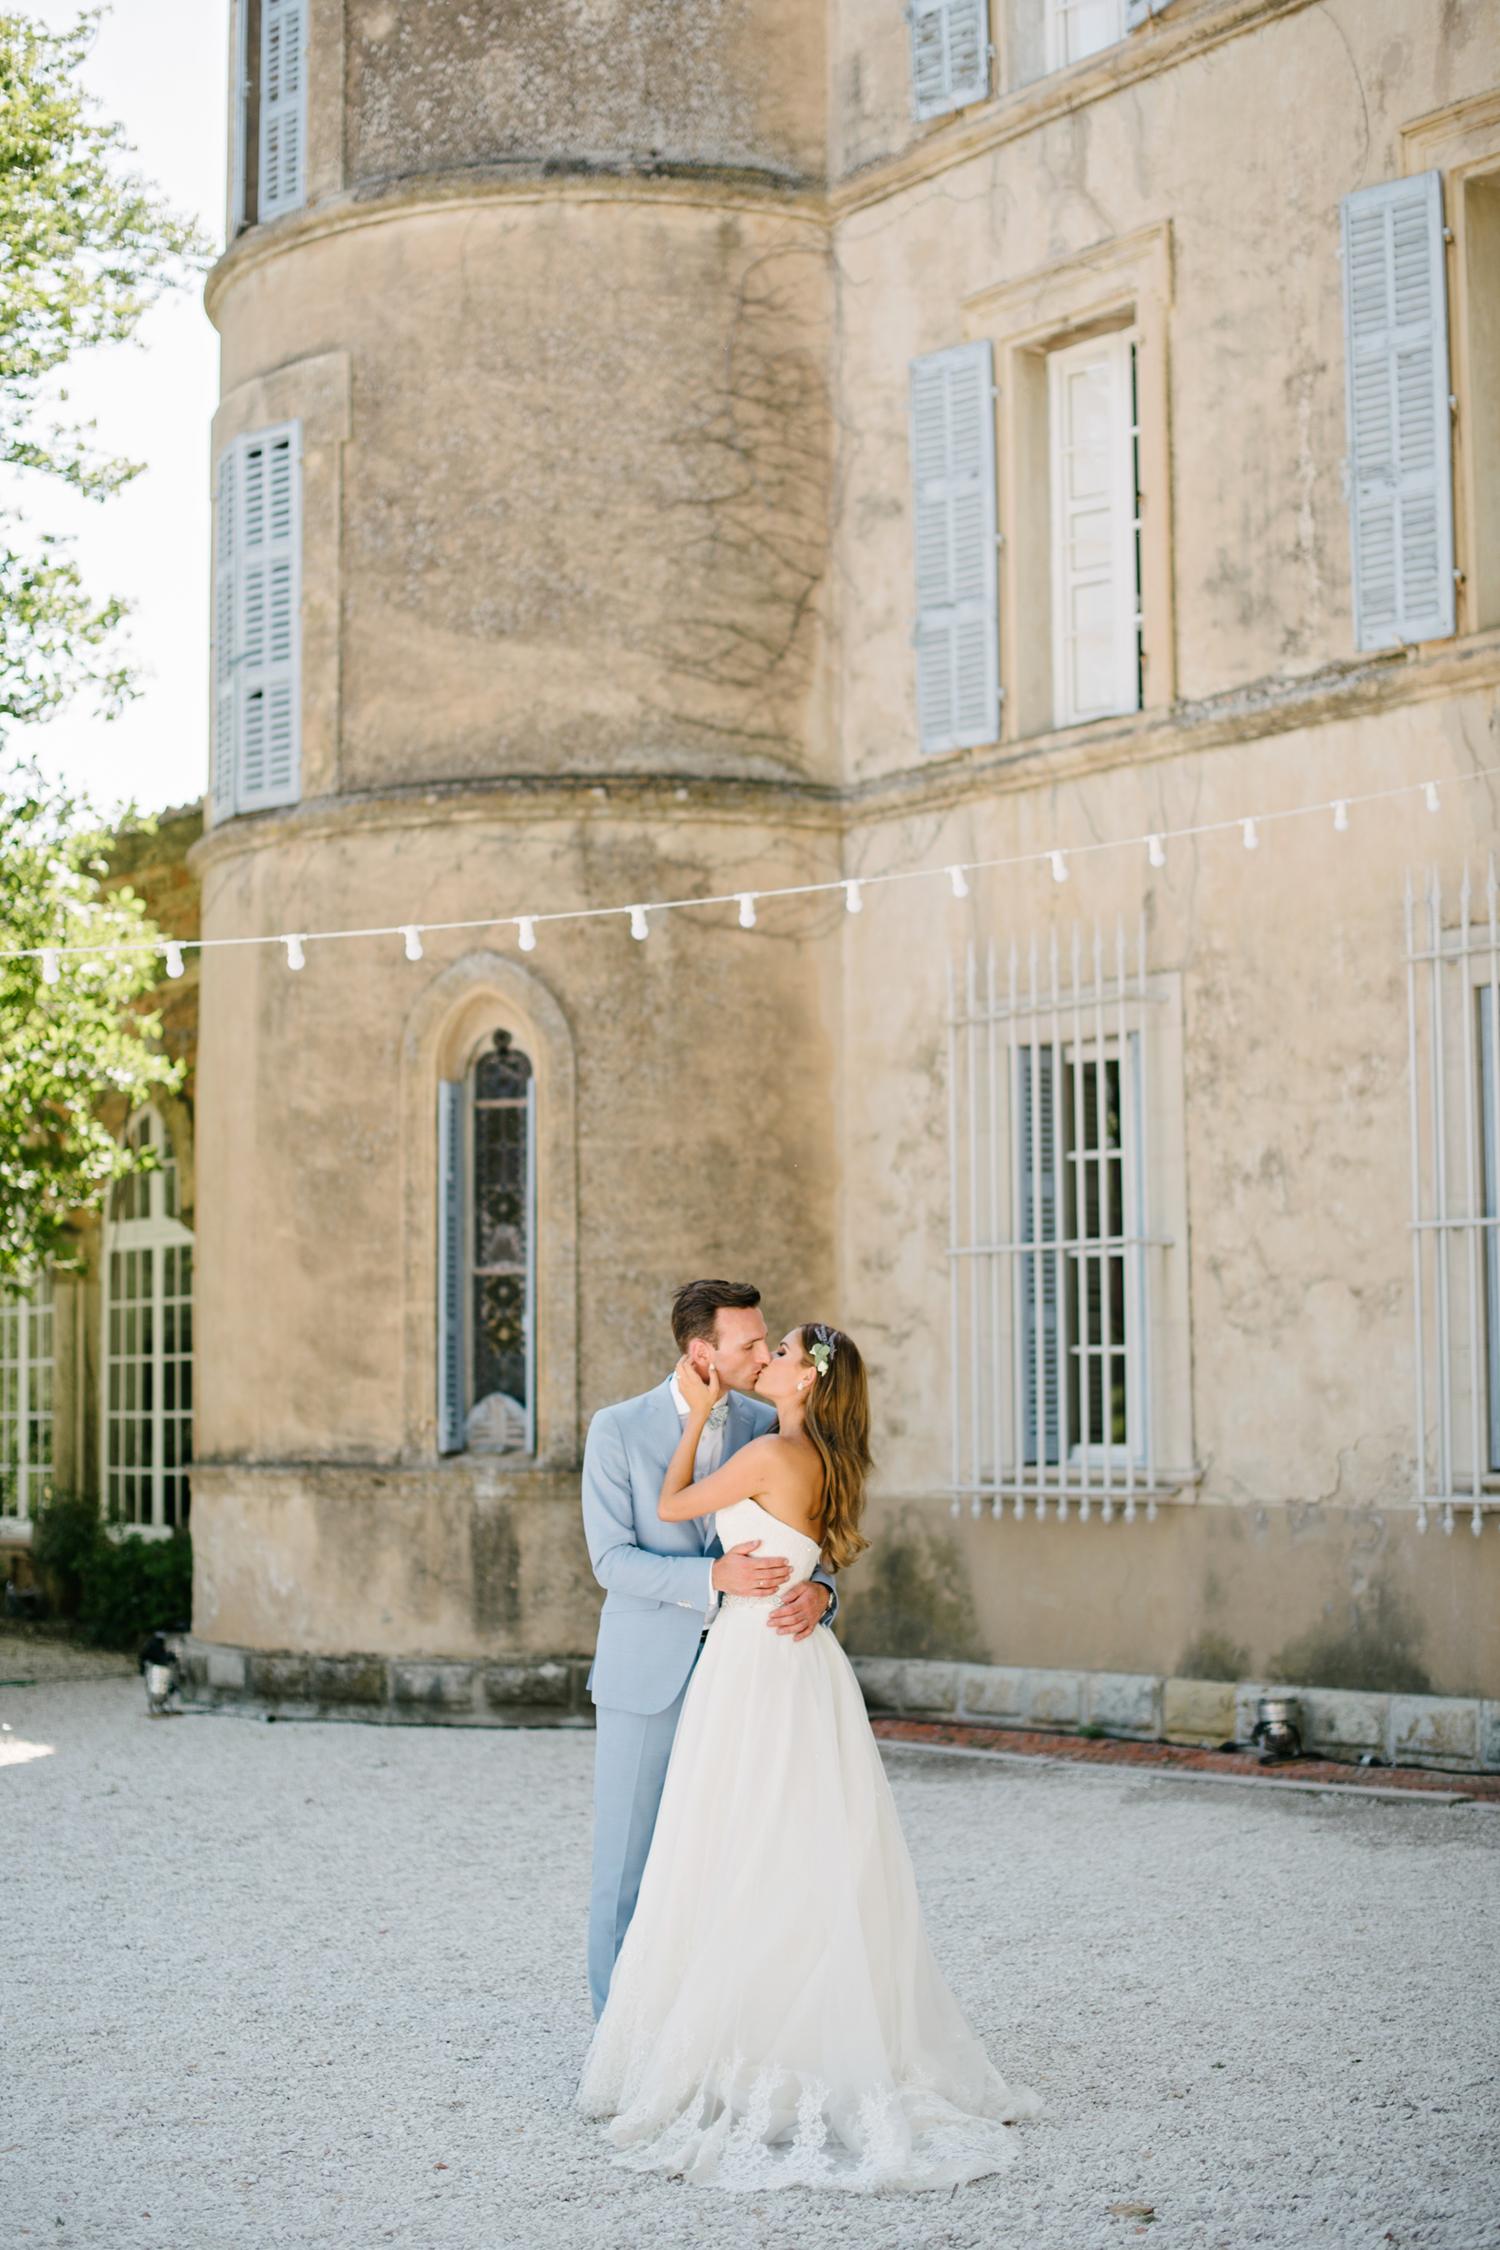 Chateau-Robernier-Wedding-Photographer-0115.jpg